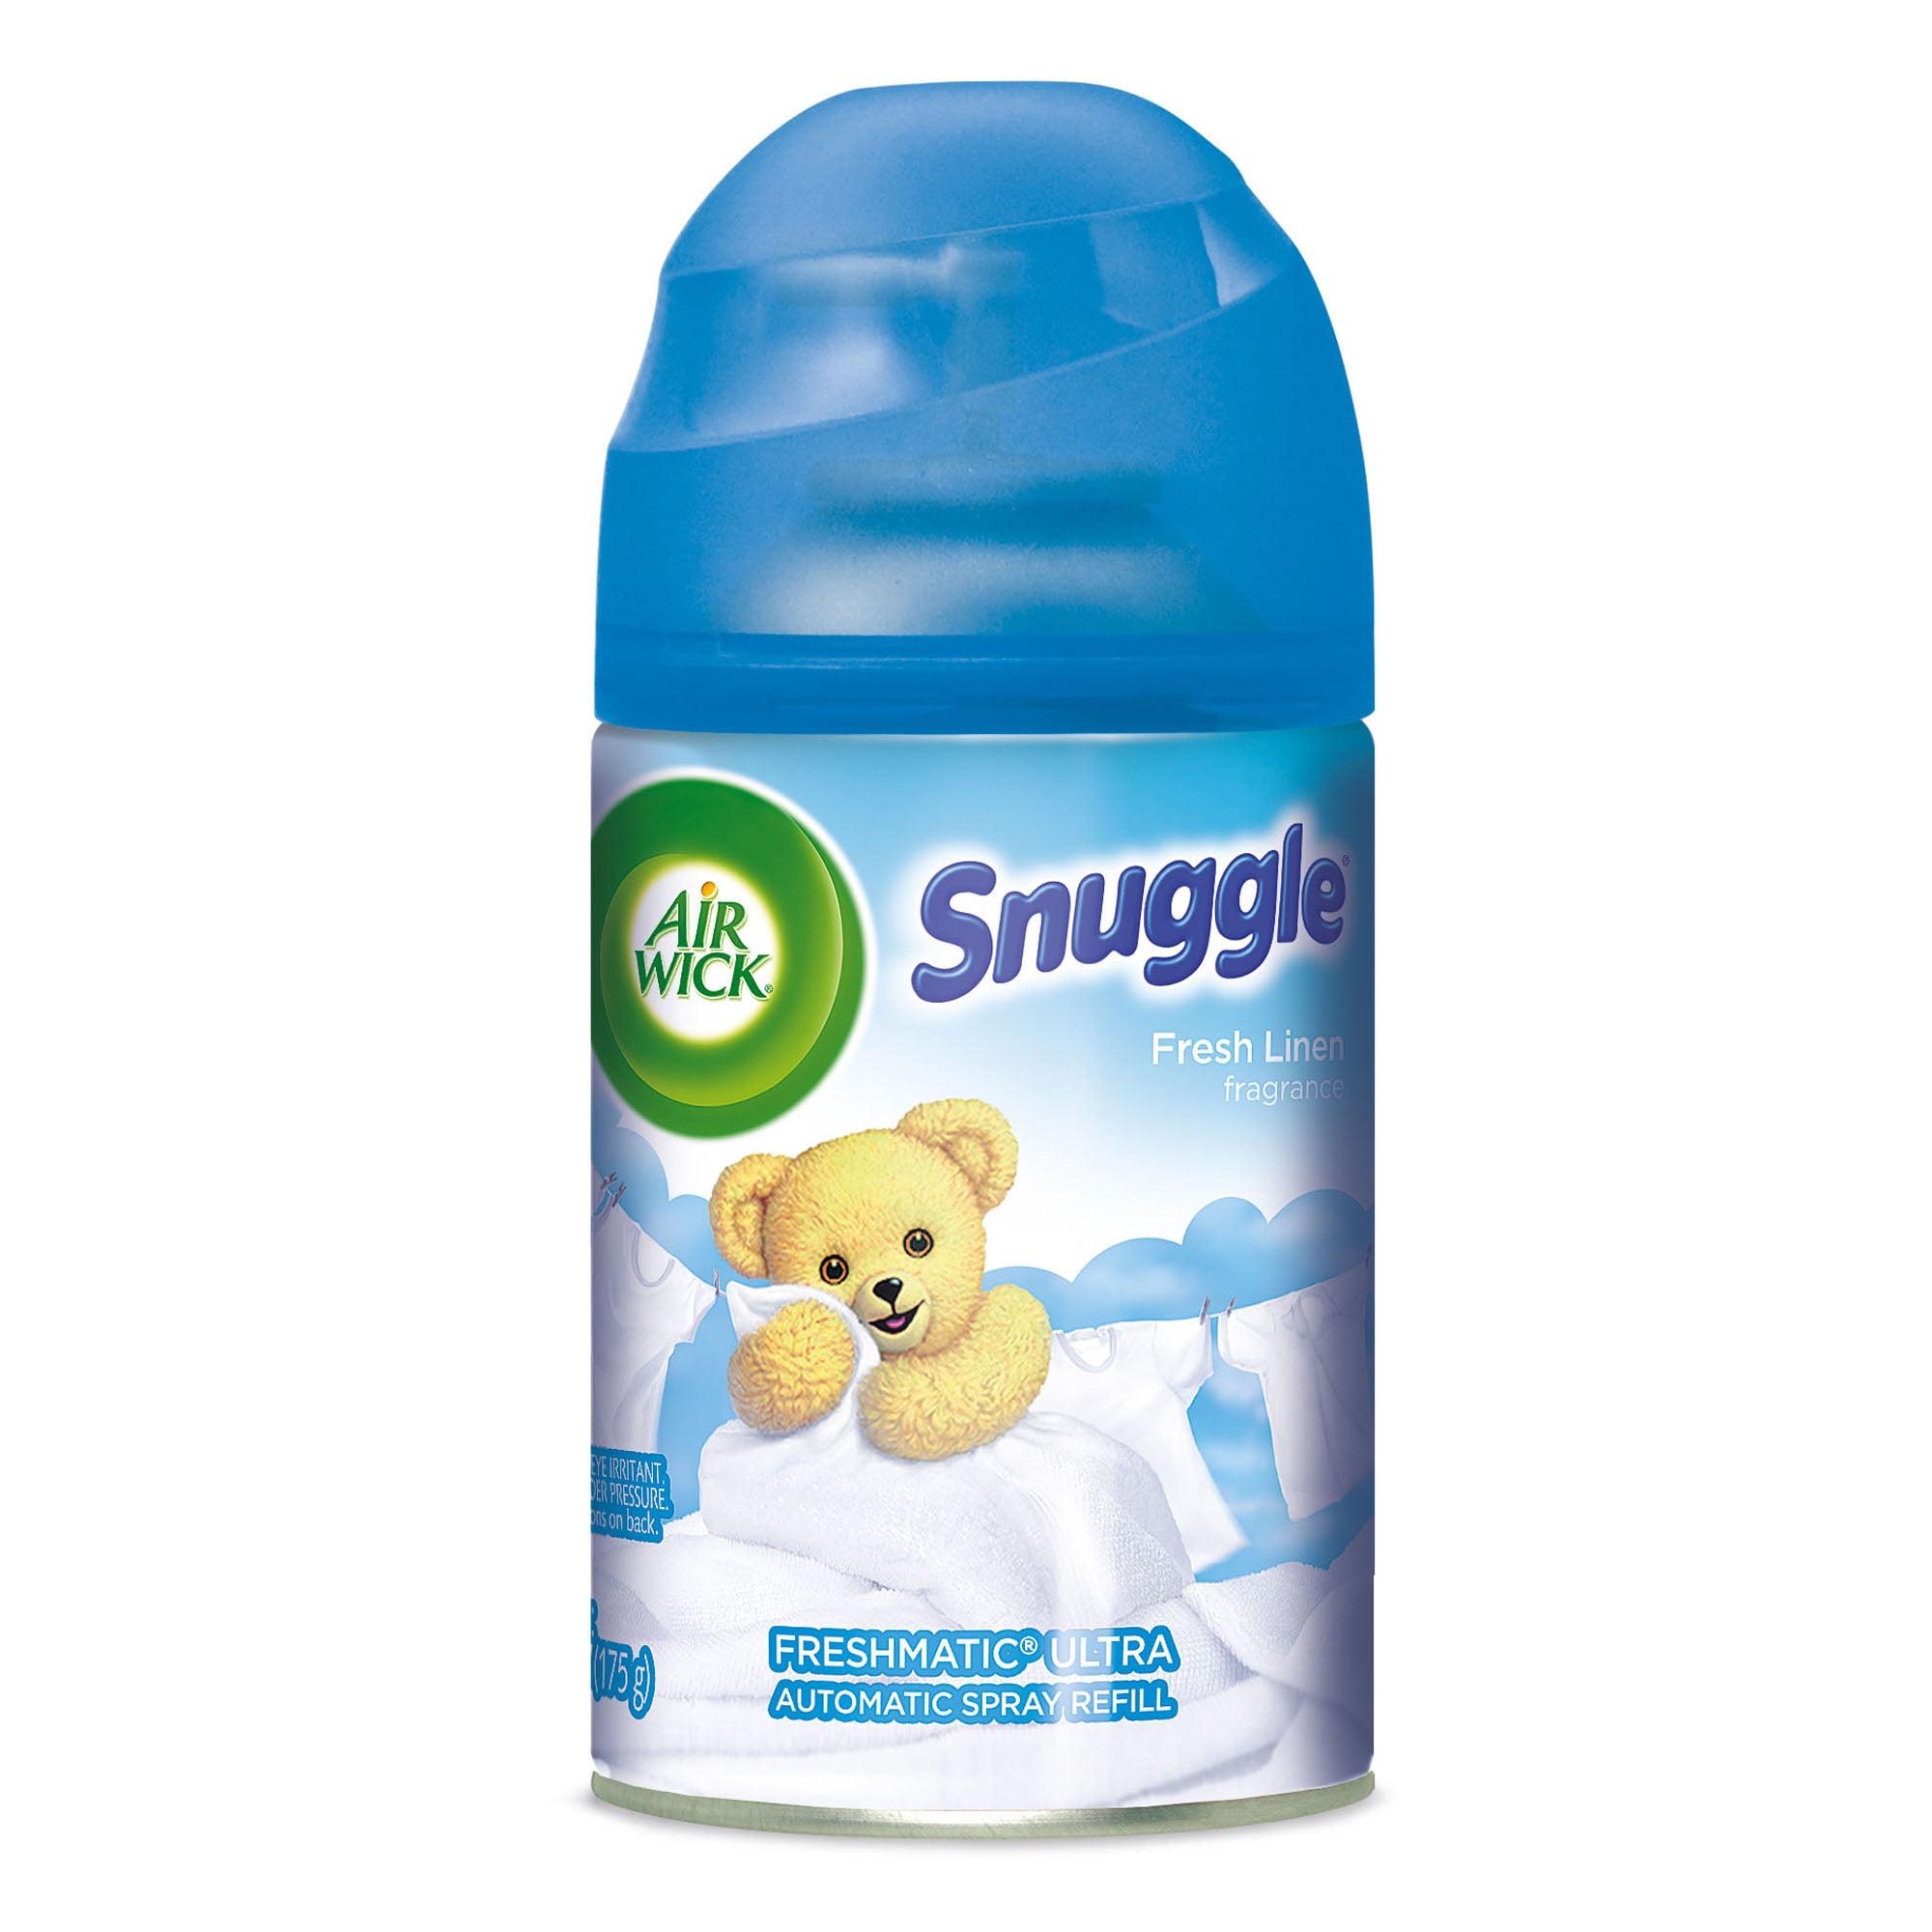 Air Wick Freshmatic Refill Automatic Spray, Snuggle Fresh Linen, 6.17oz, Air Freshener